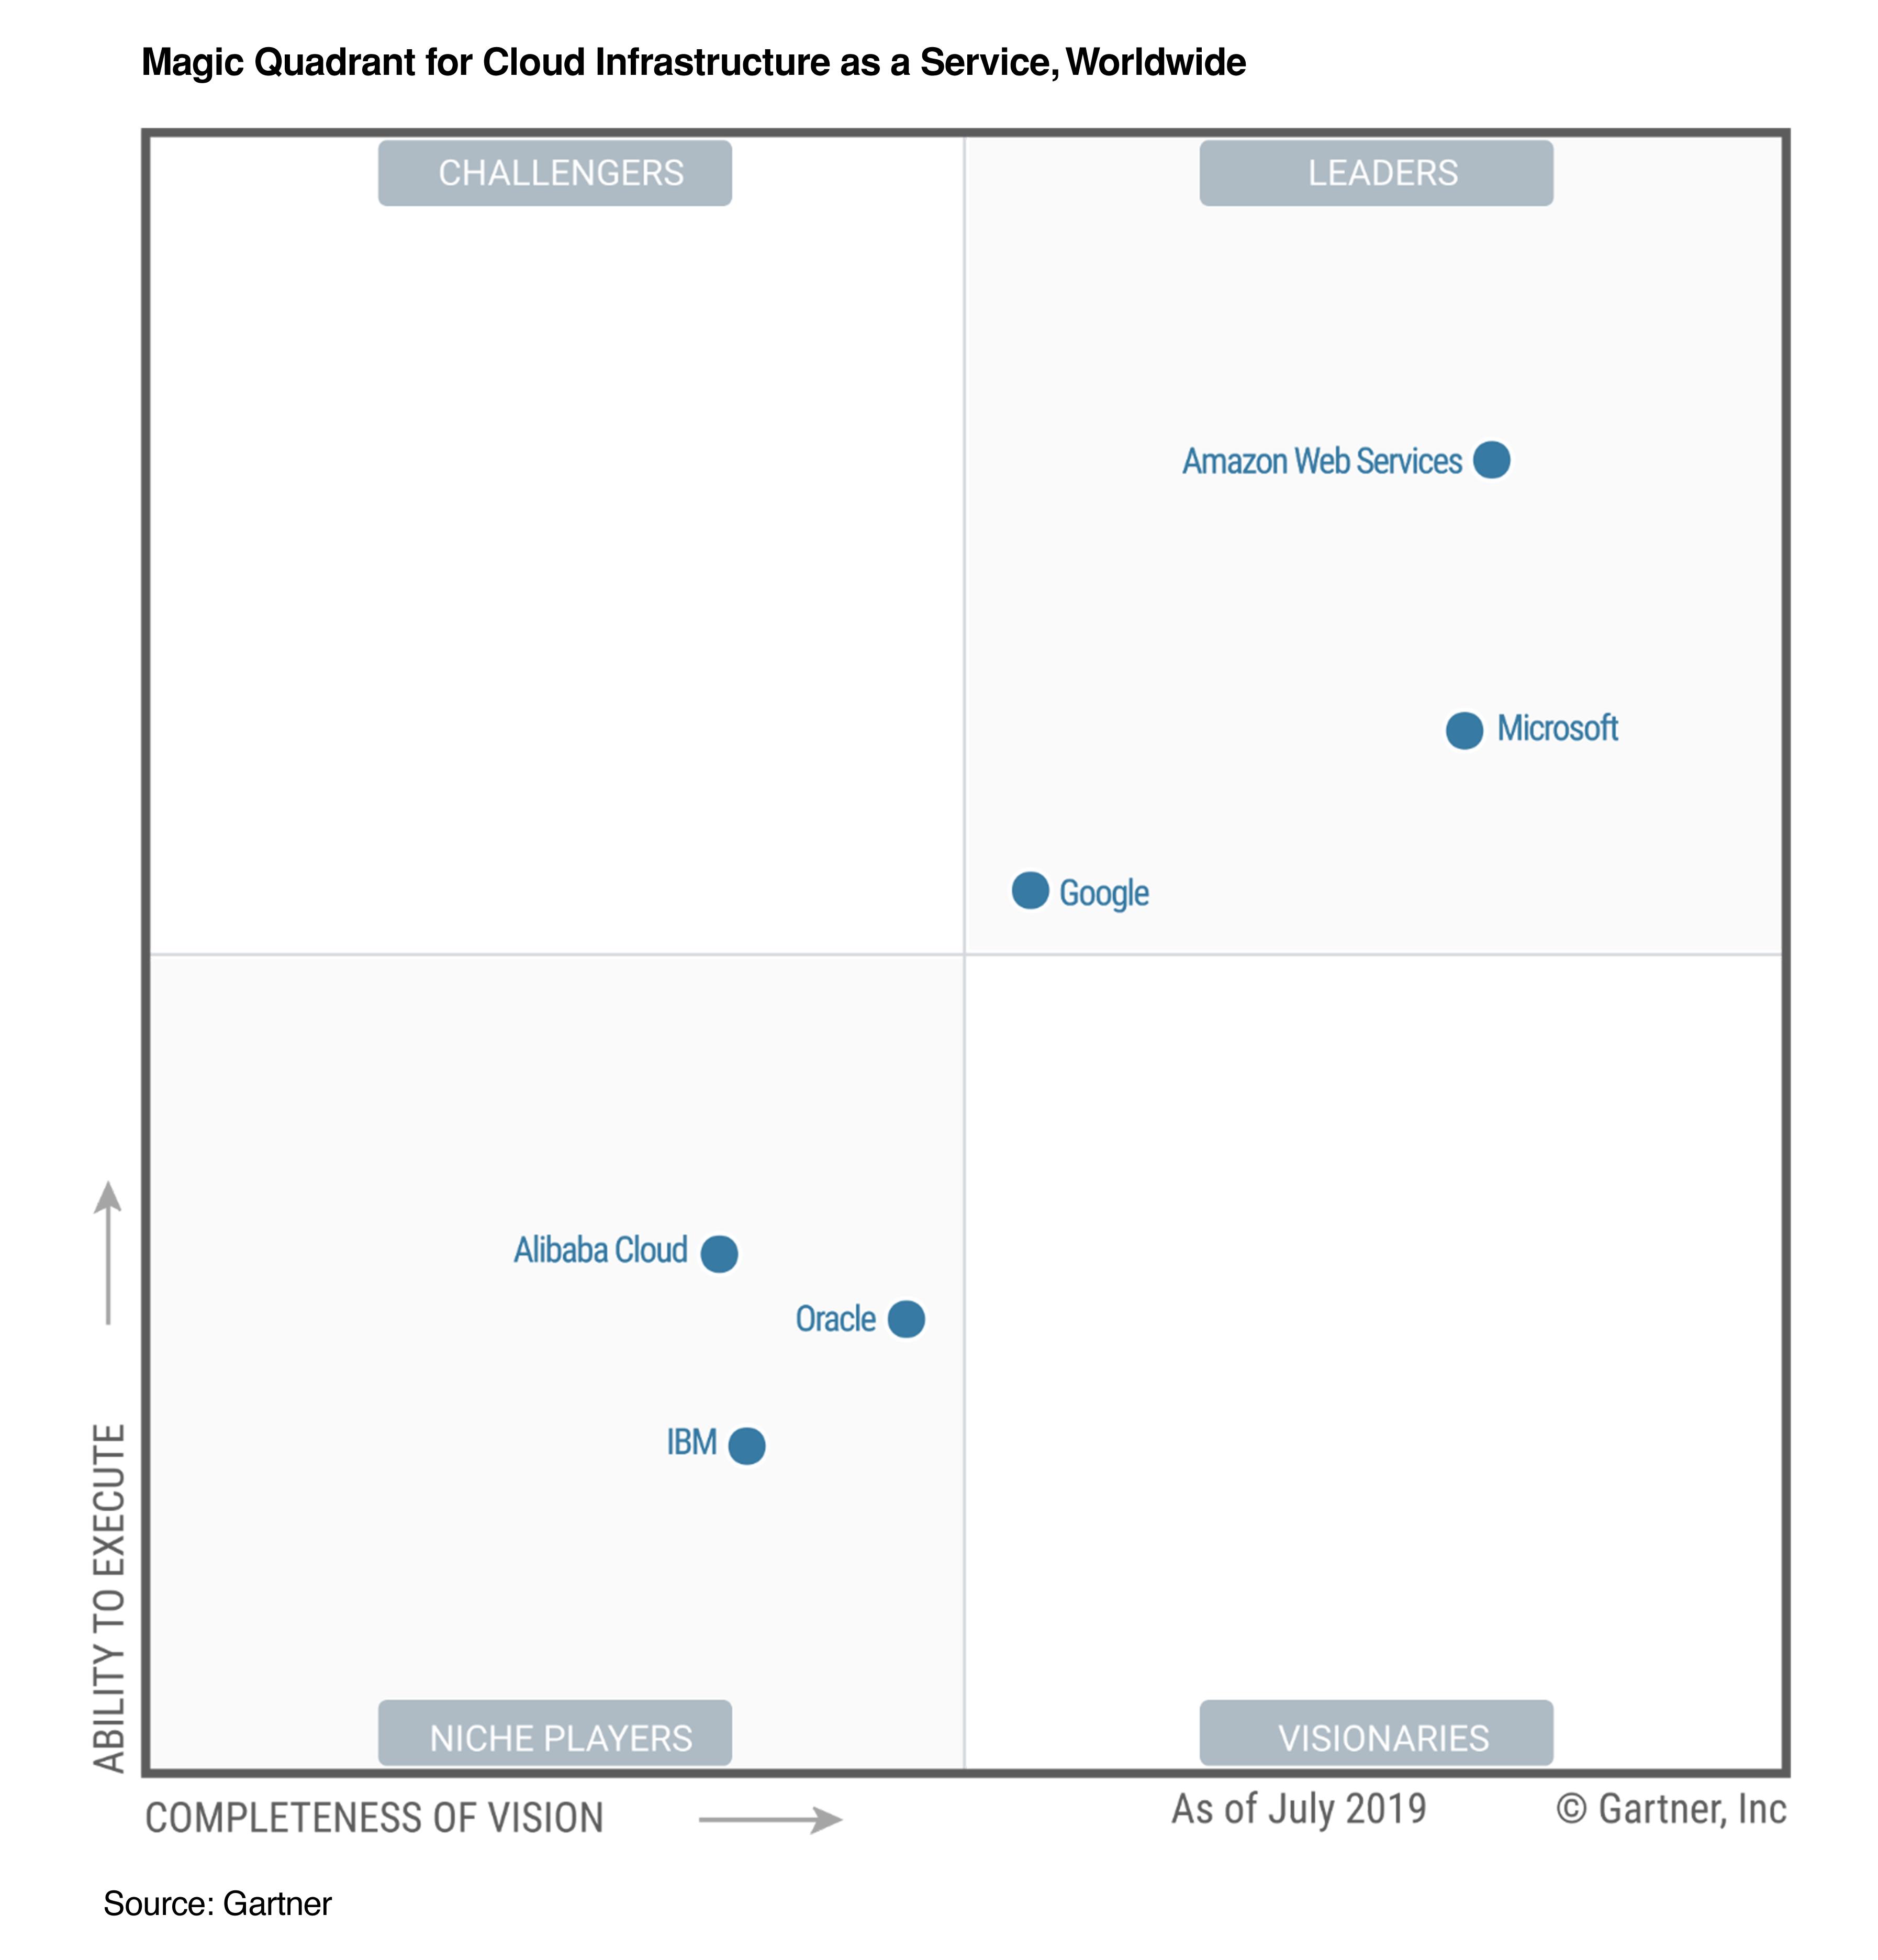 Gartner Magic Quadrant Report places AWS, Azure, and Google Cloud as IaaS leaders